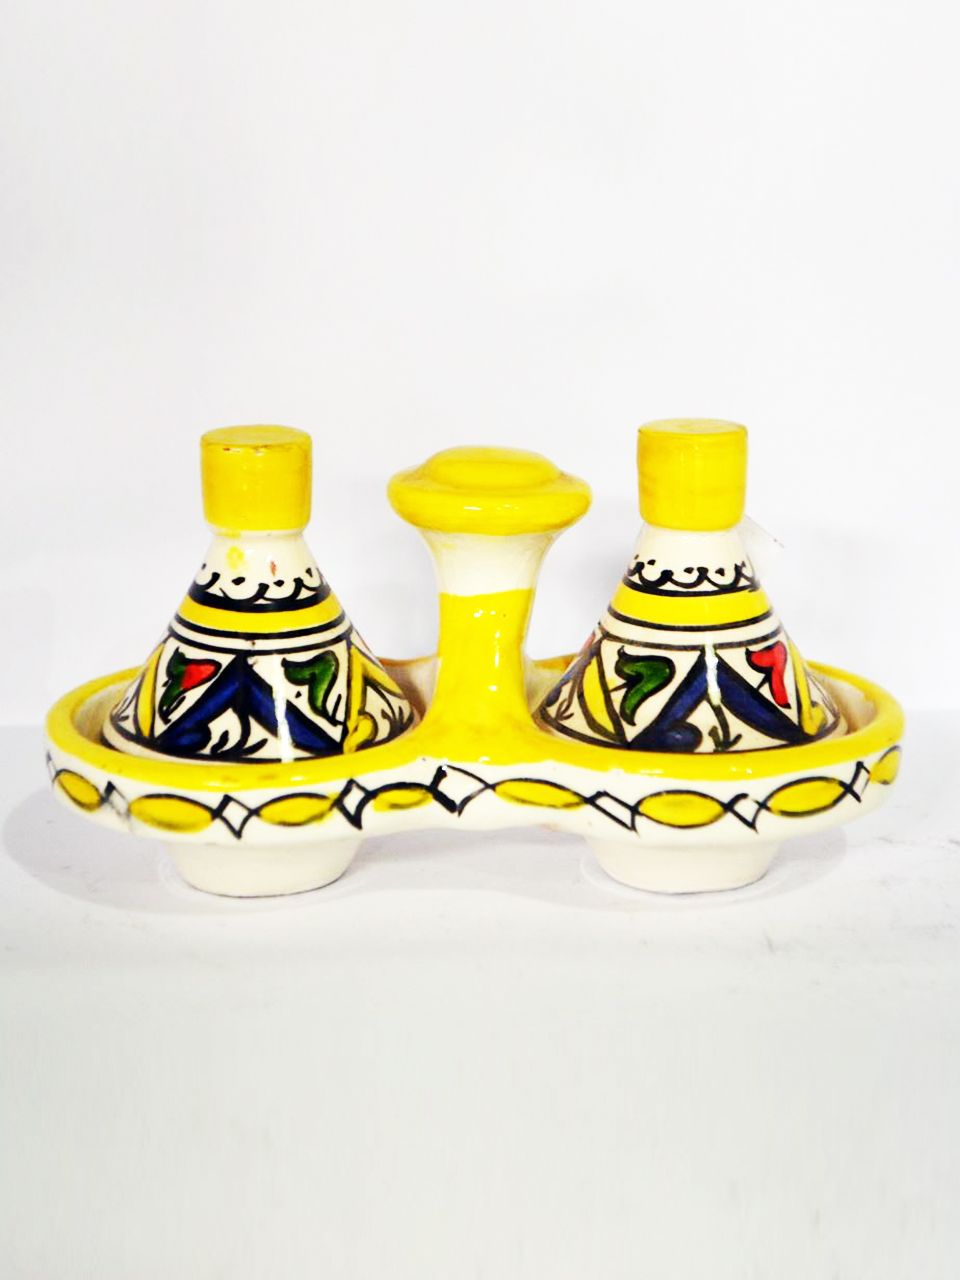 pin by biyadina on pottery decorate your room room living room rh pinterest com au diy decorate your living room diy decorate your living room